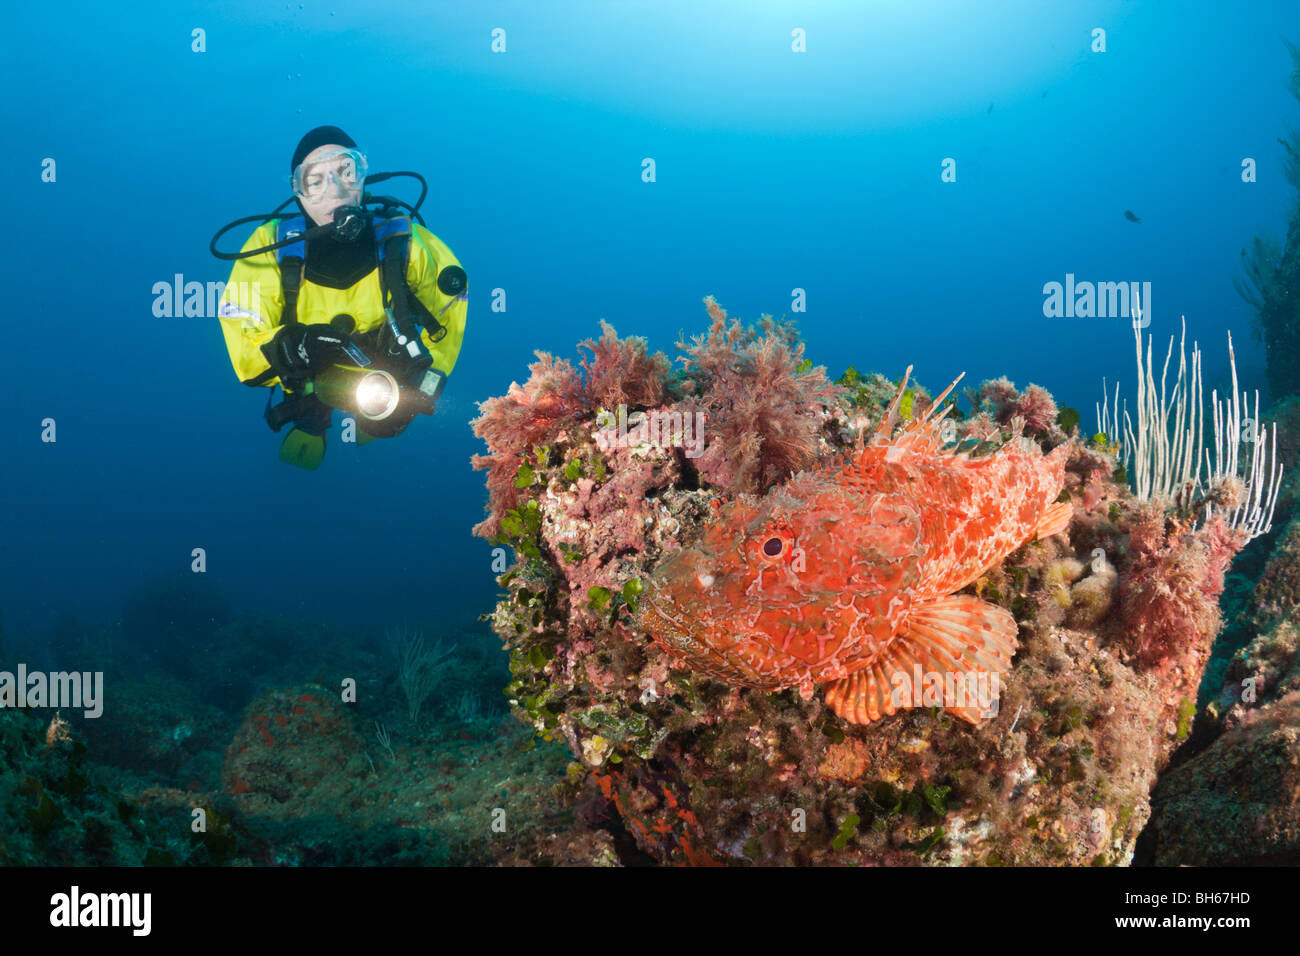 Grand Sébaste et Scuba Diver, Scorpaena scrofa, Les Ferranelles, Îles Medes, Costa Brava, Espagne, Mer Photo Stock